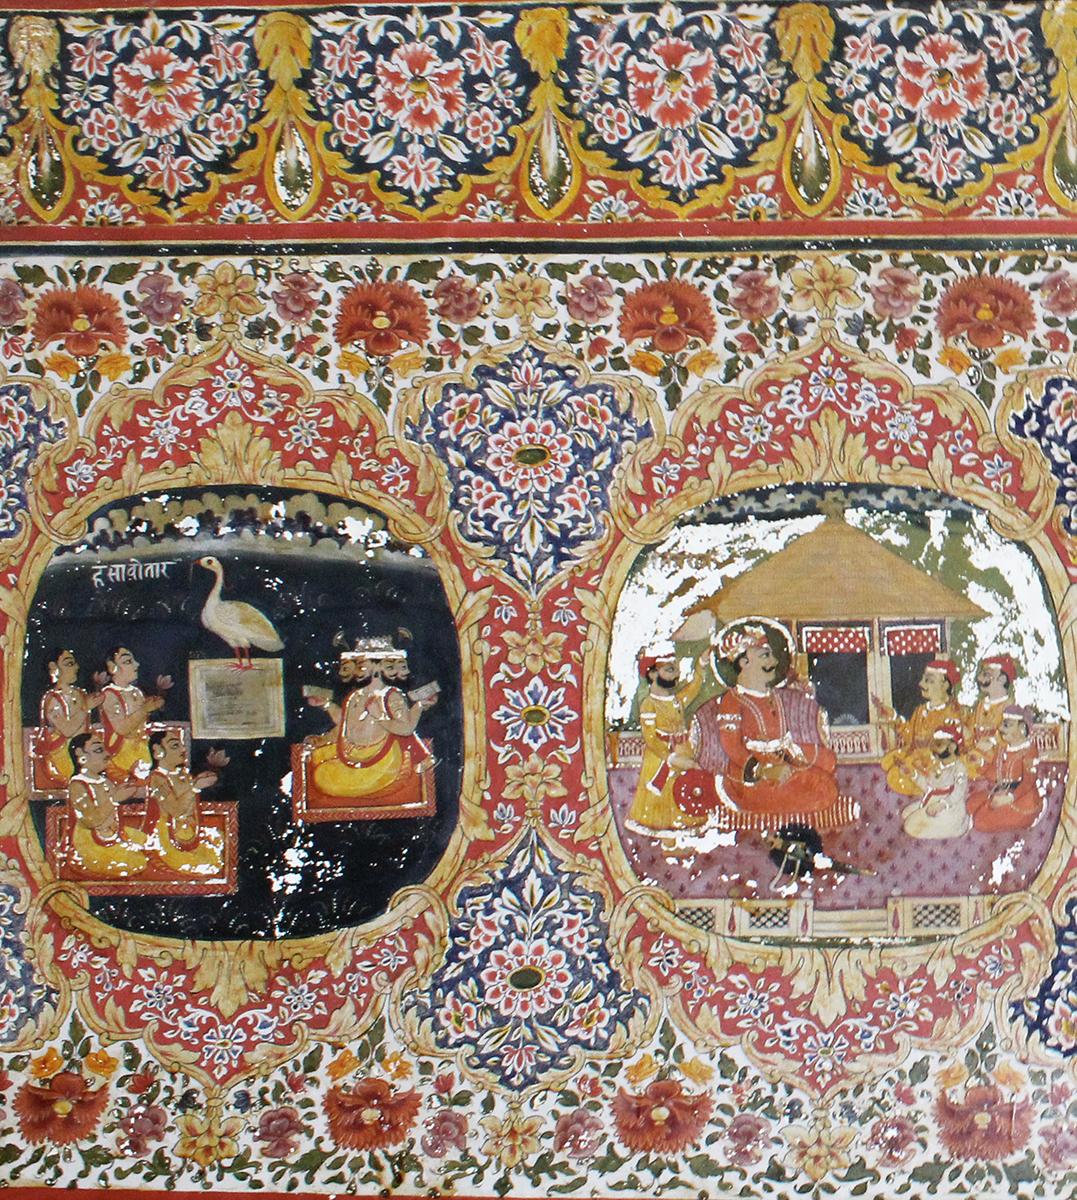 interior design, india, vernacular, architecture, natural design, rajasthan design, sona chandi haveli, frescoes, shivani dogra